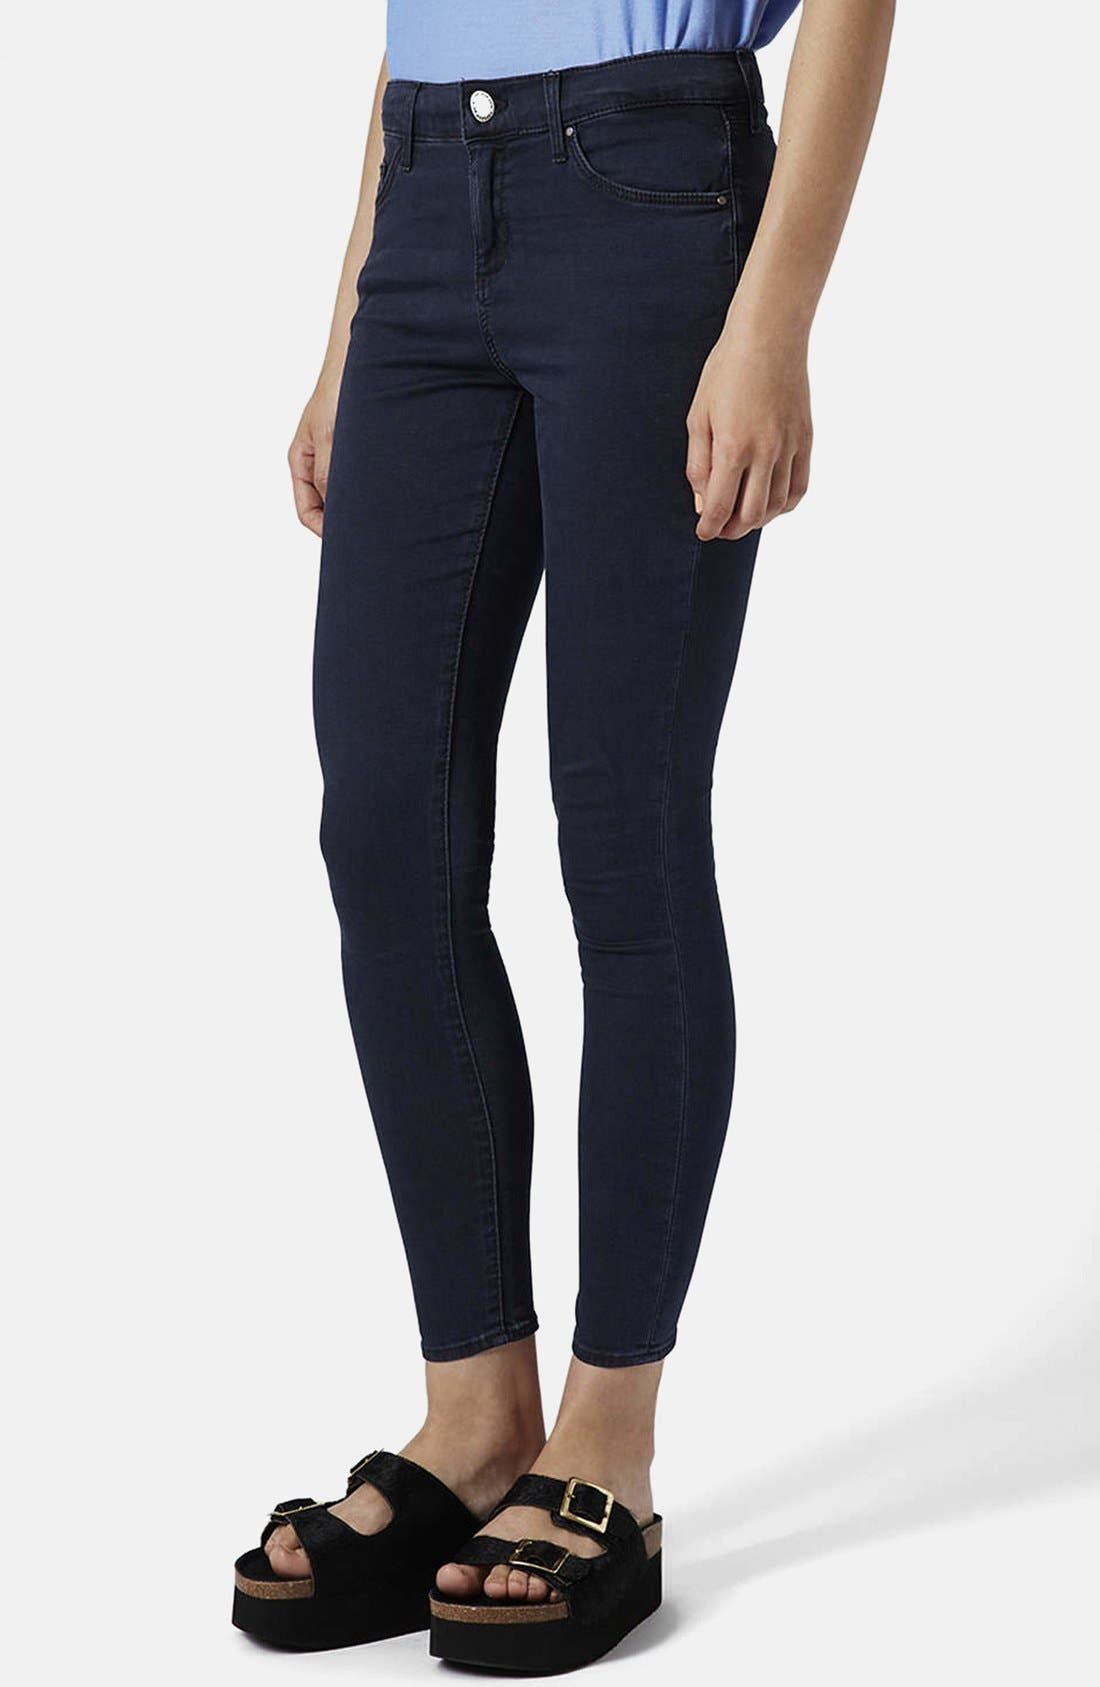 Main Image - Topshop Moto 'Leigh' Crop Skinny Jeans (Blue Black) (Regular, Short & Long)